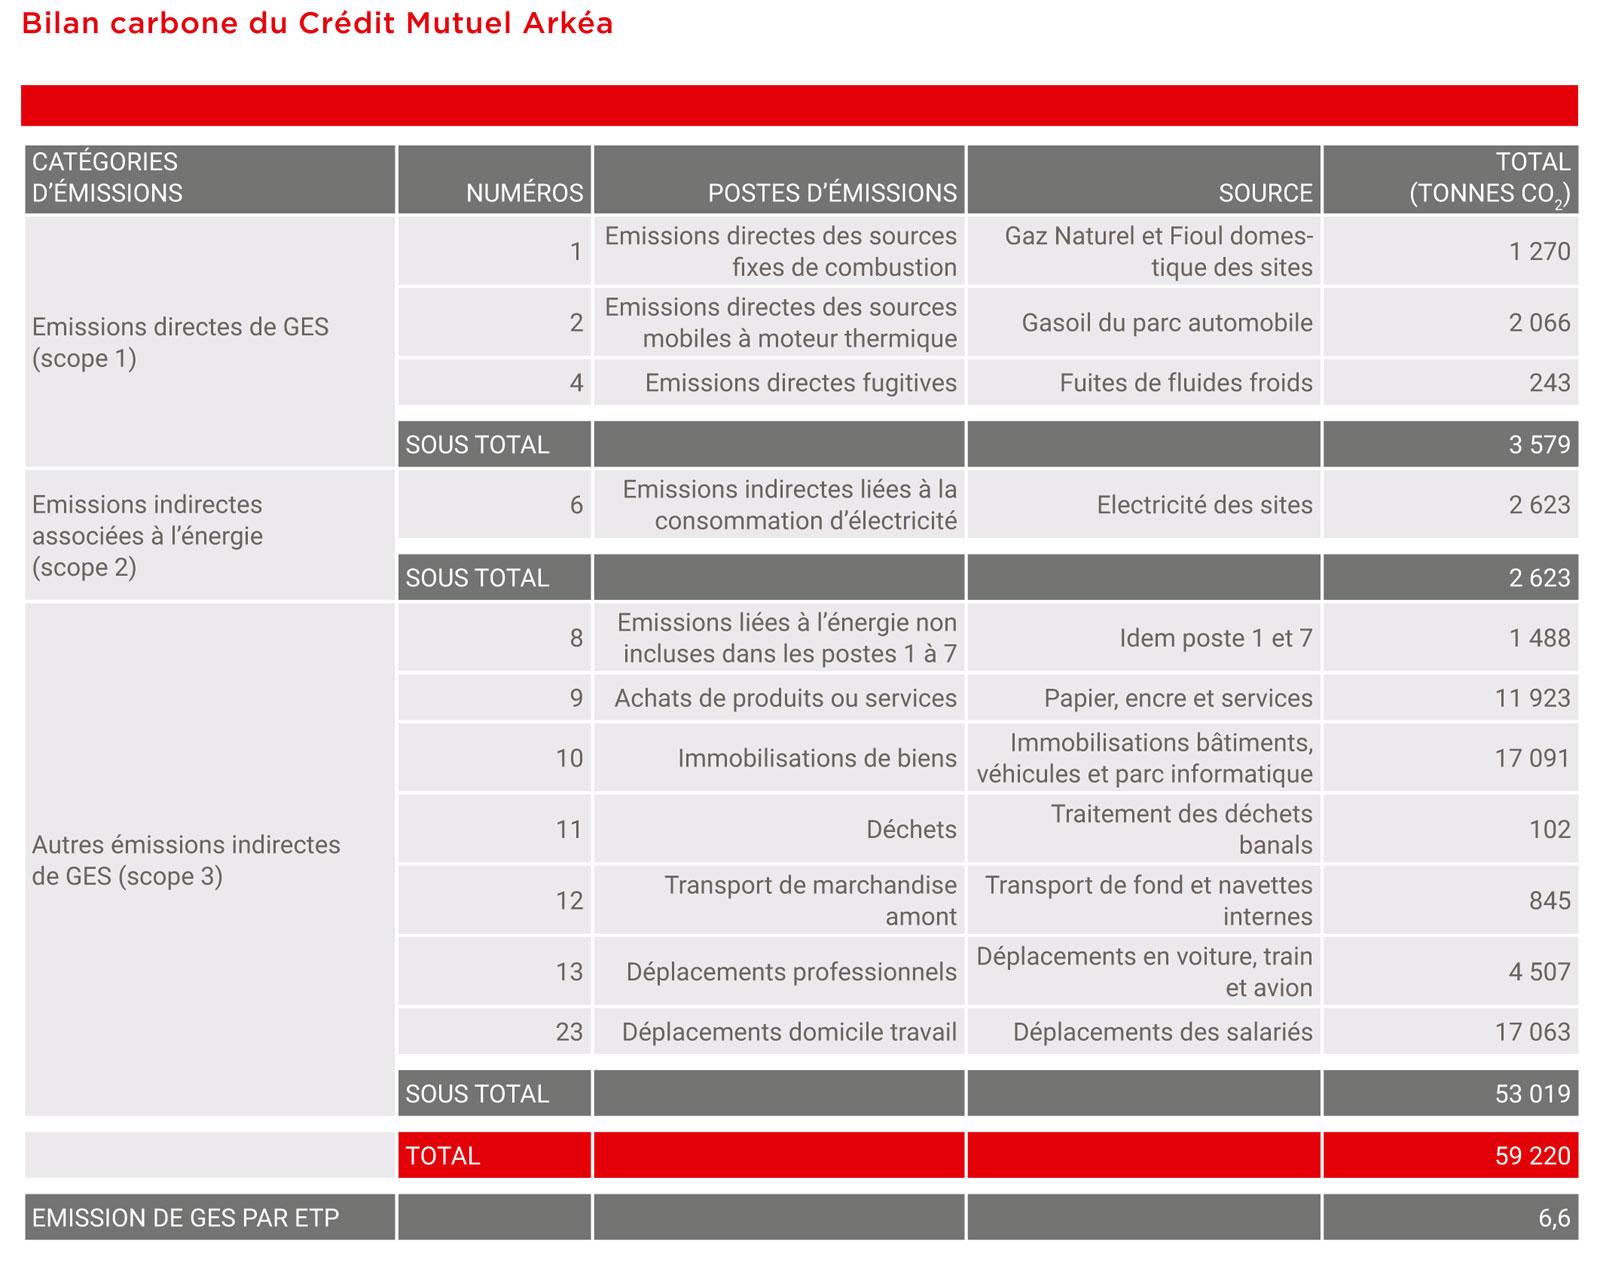 Bilan carbone du CM Arkéa